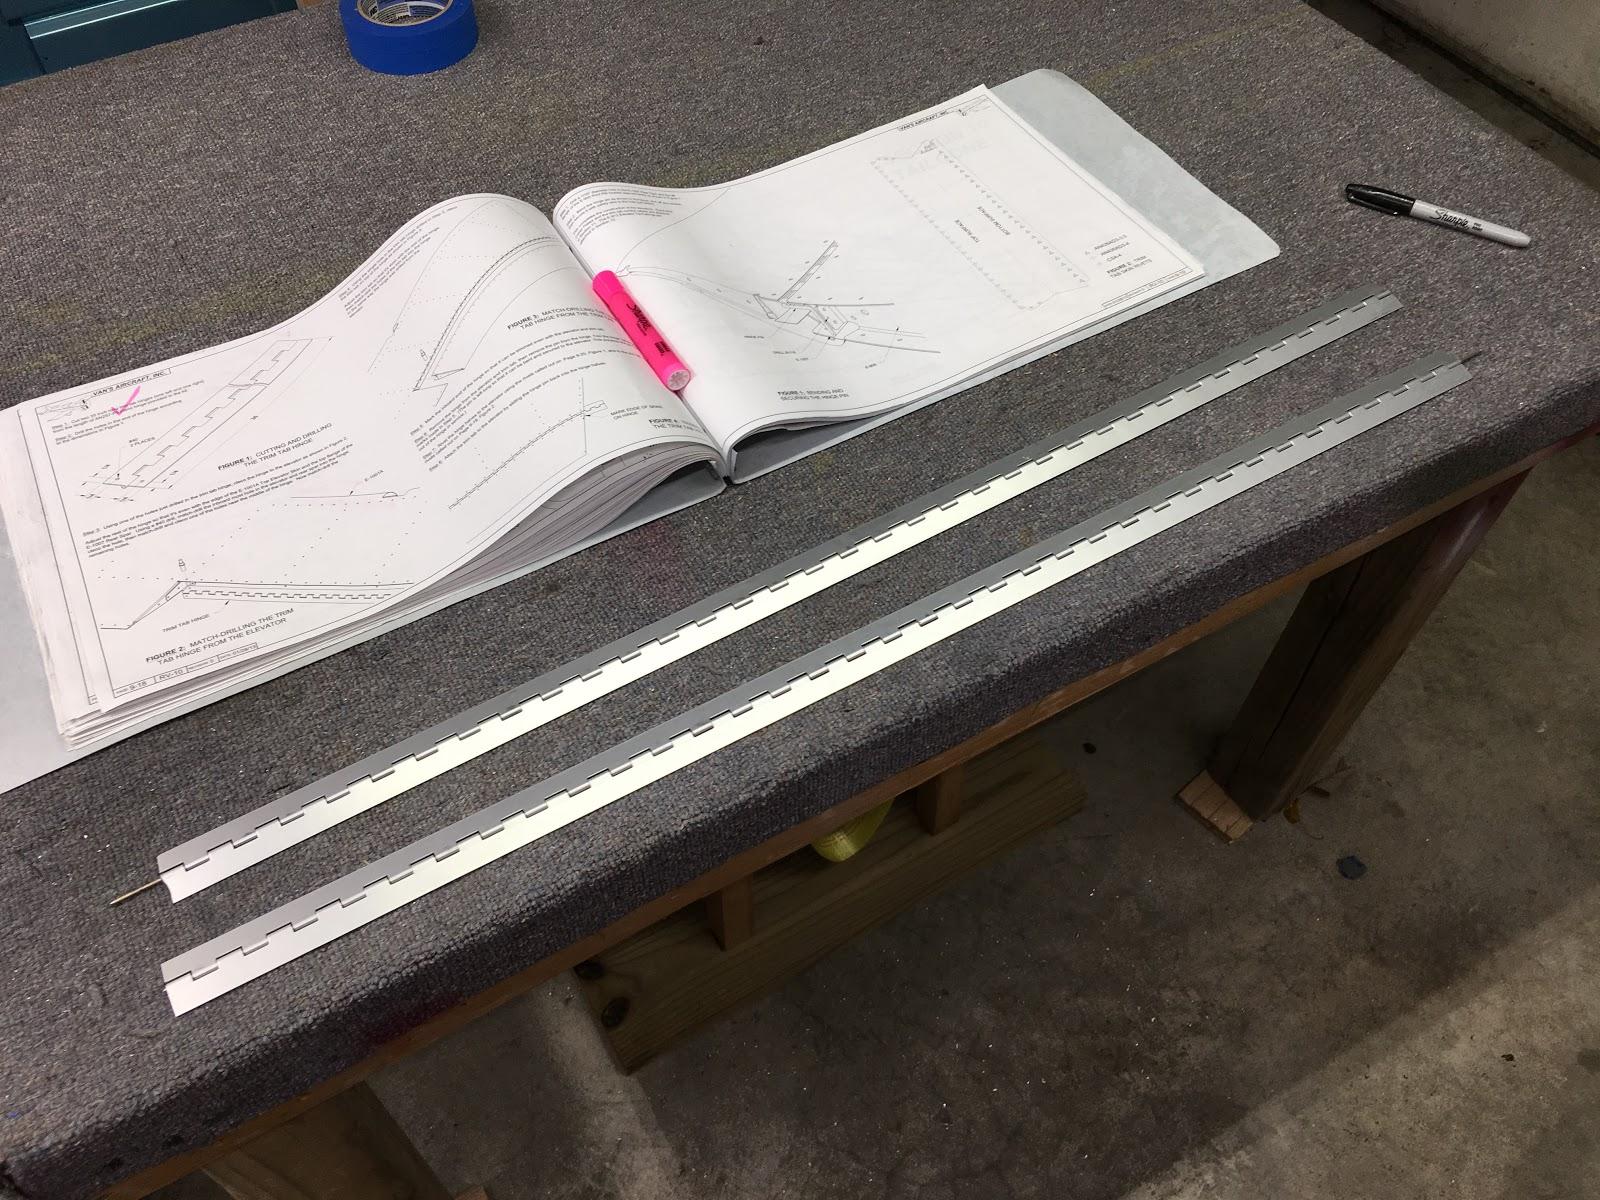 Brantel S Rv 10 Build Blog Elevator Trim Tab Hinges